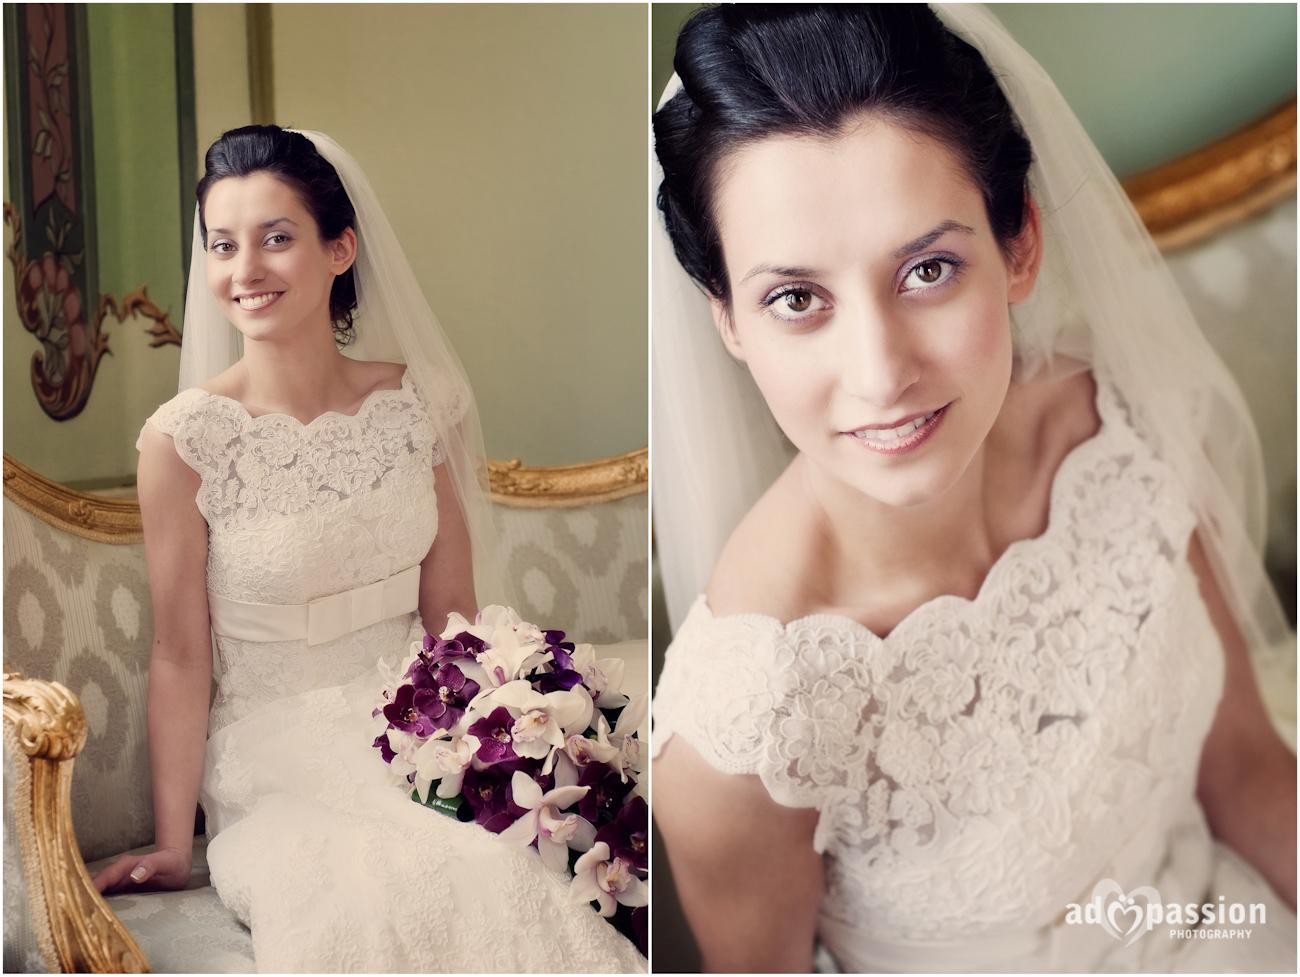 AD Passion Photography | 2011-05-22-Miriam&Florin_28 | Adelin, Dida, fotograf profesionist, fotograf de nunta, fotografie de nunta, fotograf Timisoara, fotograf Craiova, fotograf Bucuresti, fotograf Arad, nunta Timisoara, nunta Arad, nunta Bucuresti, nunta Craiova